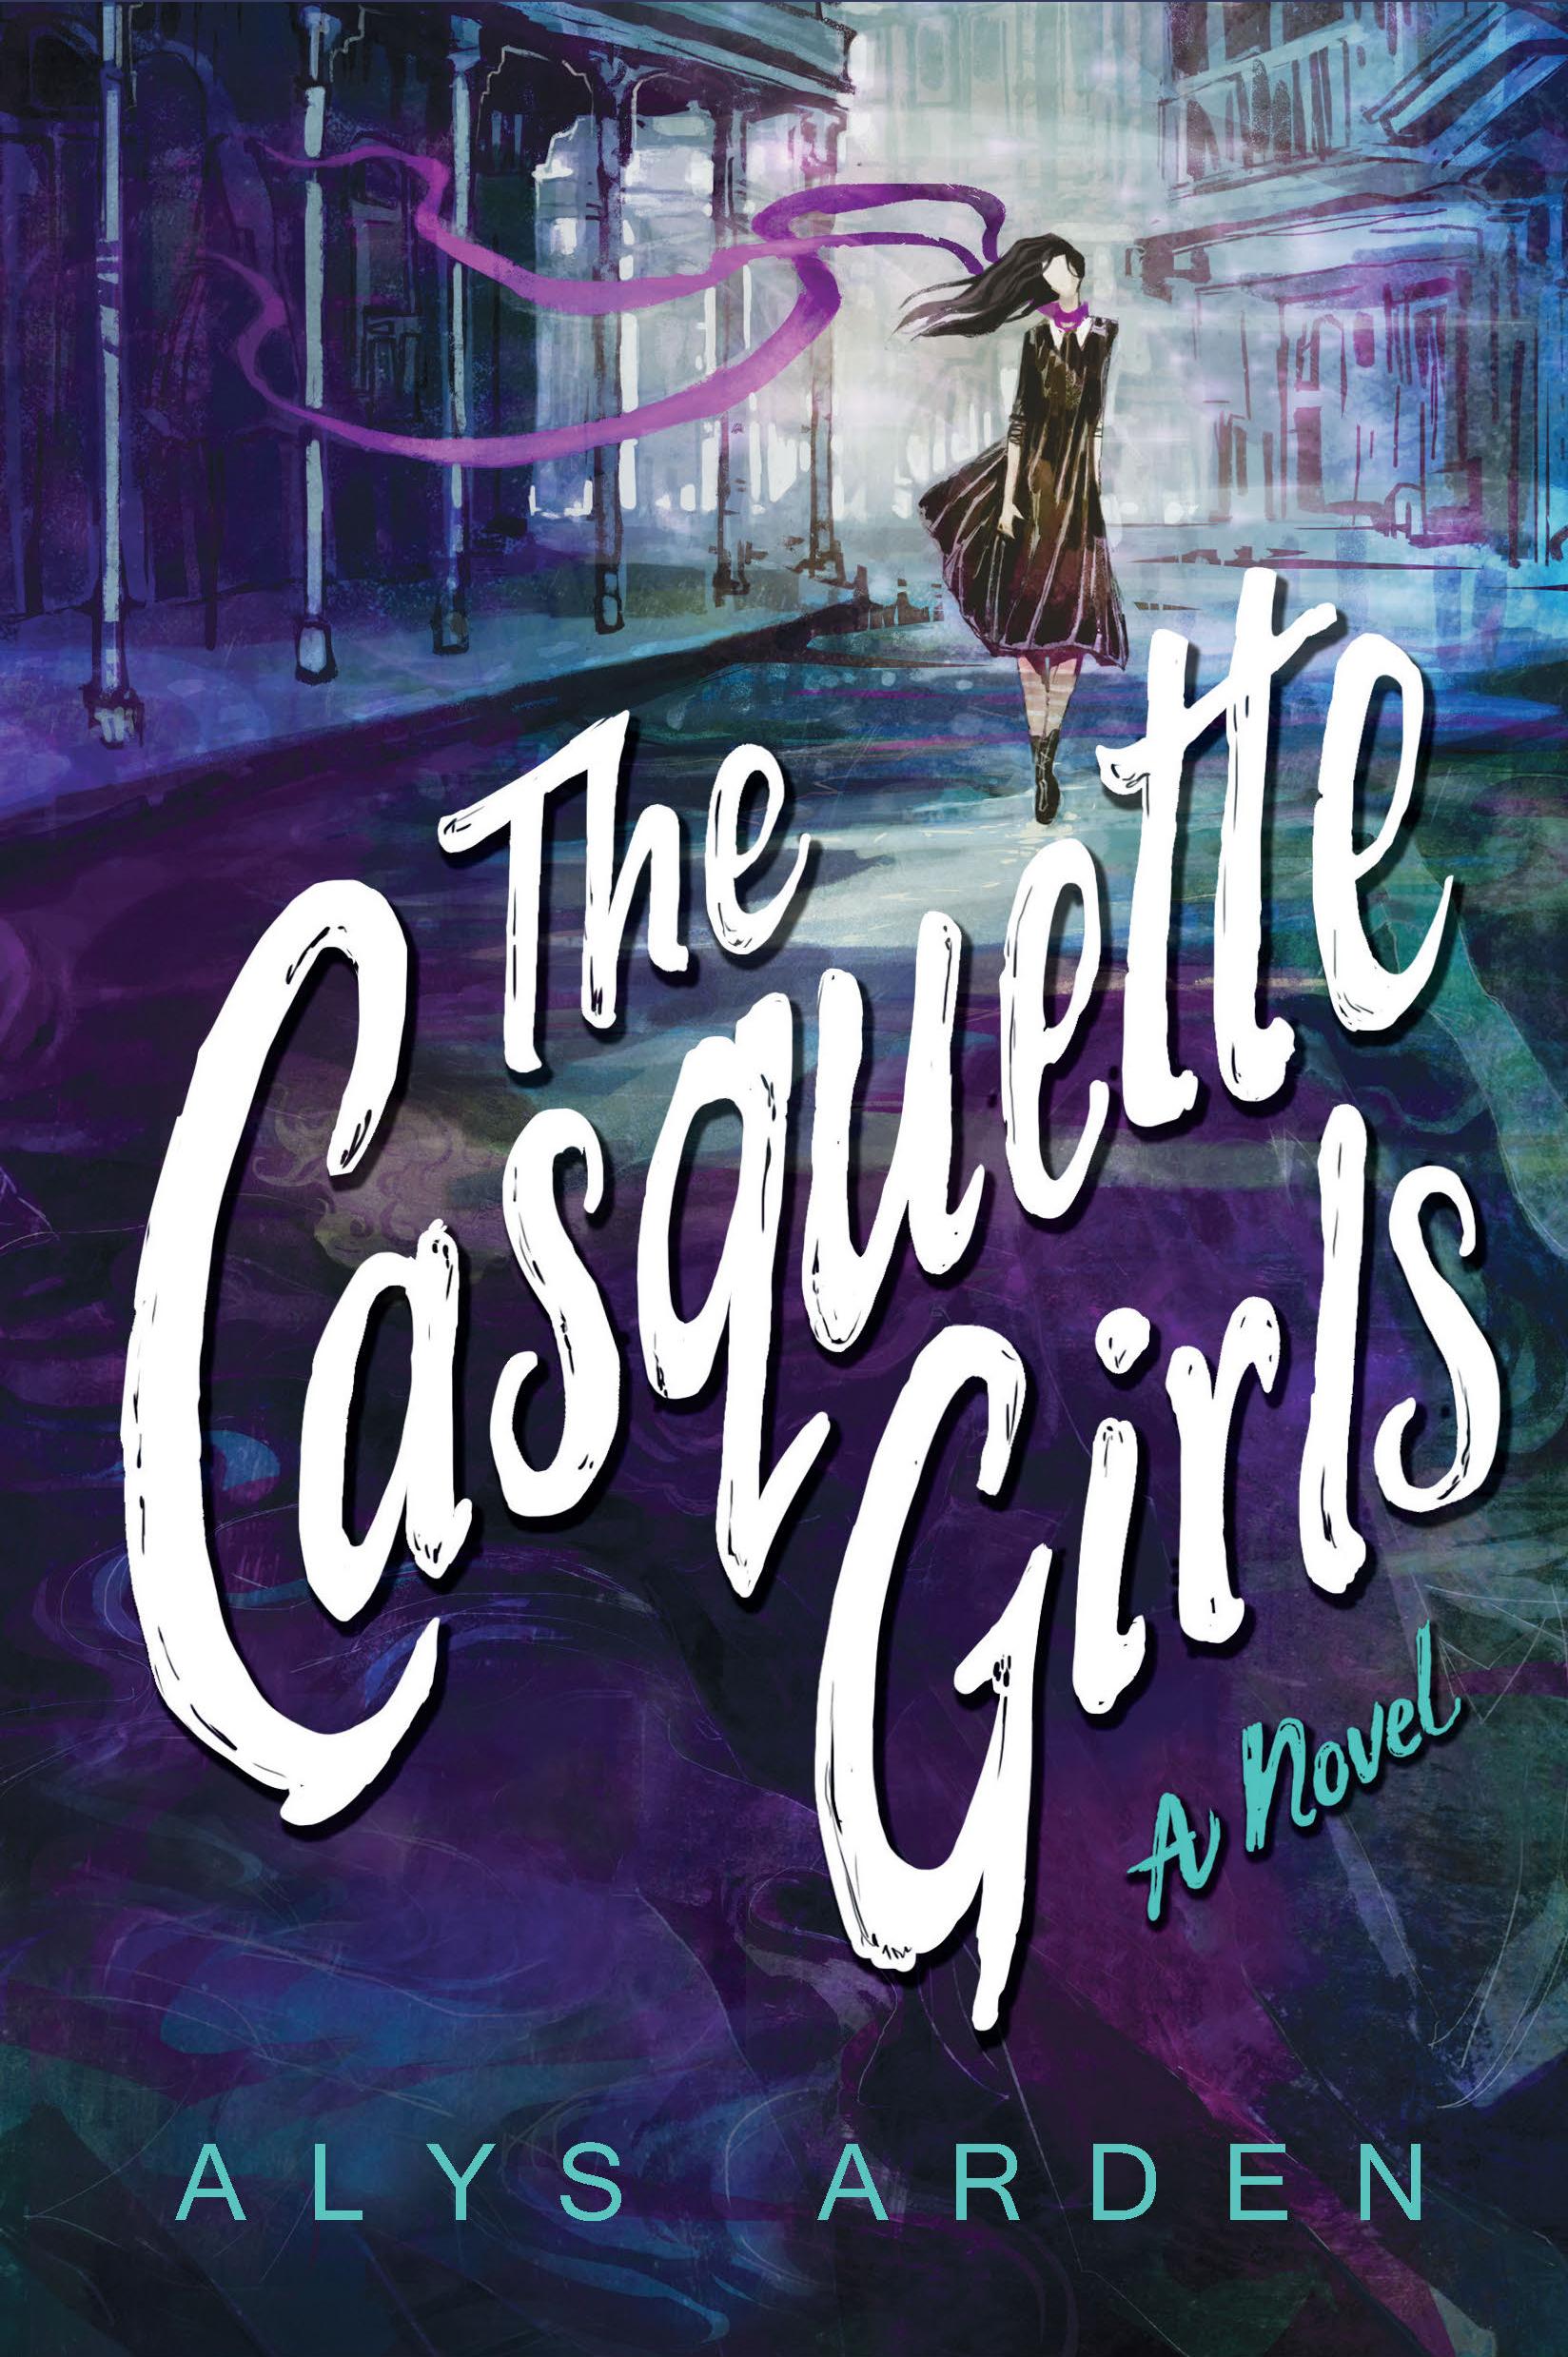 The_Casquette_Girls_cover_art_hg